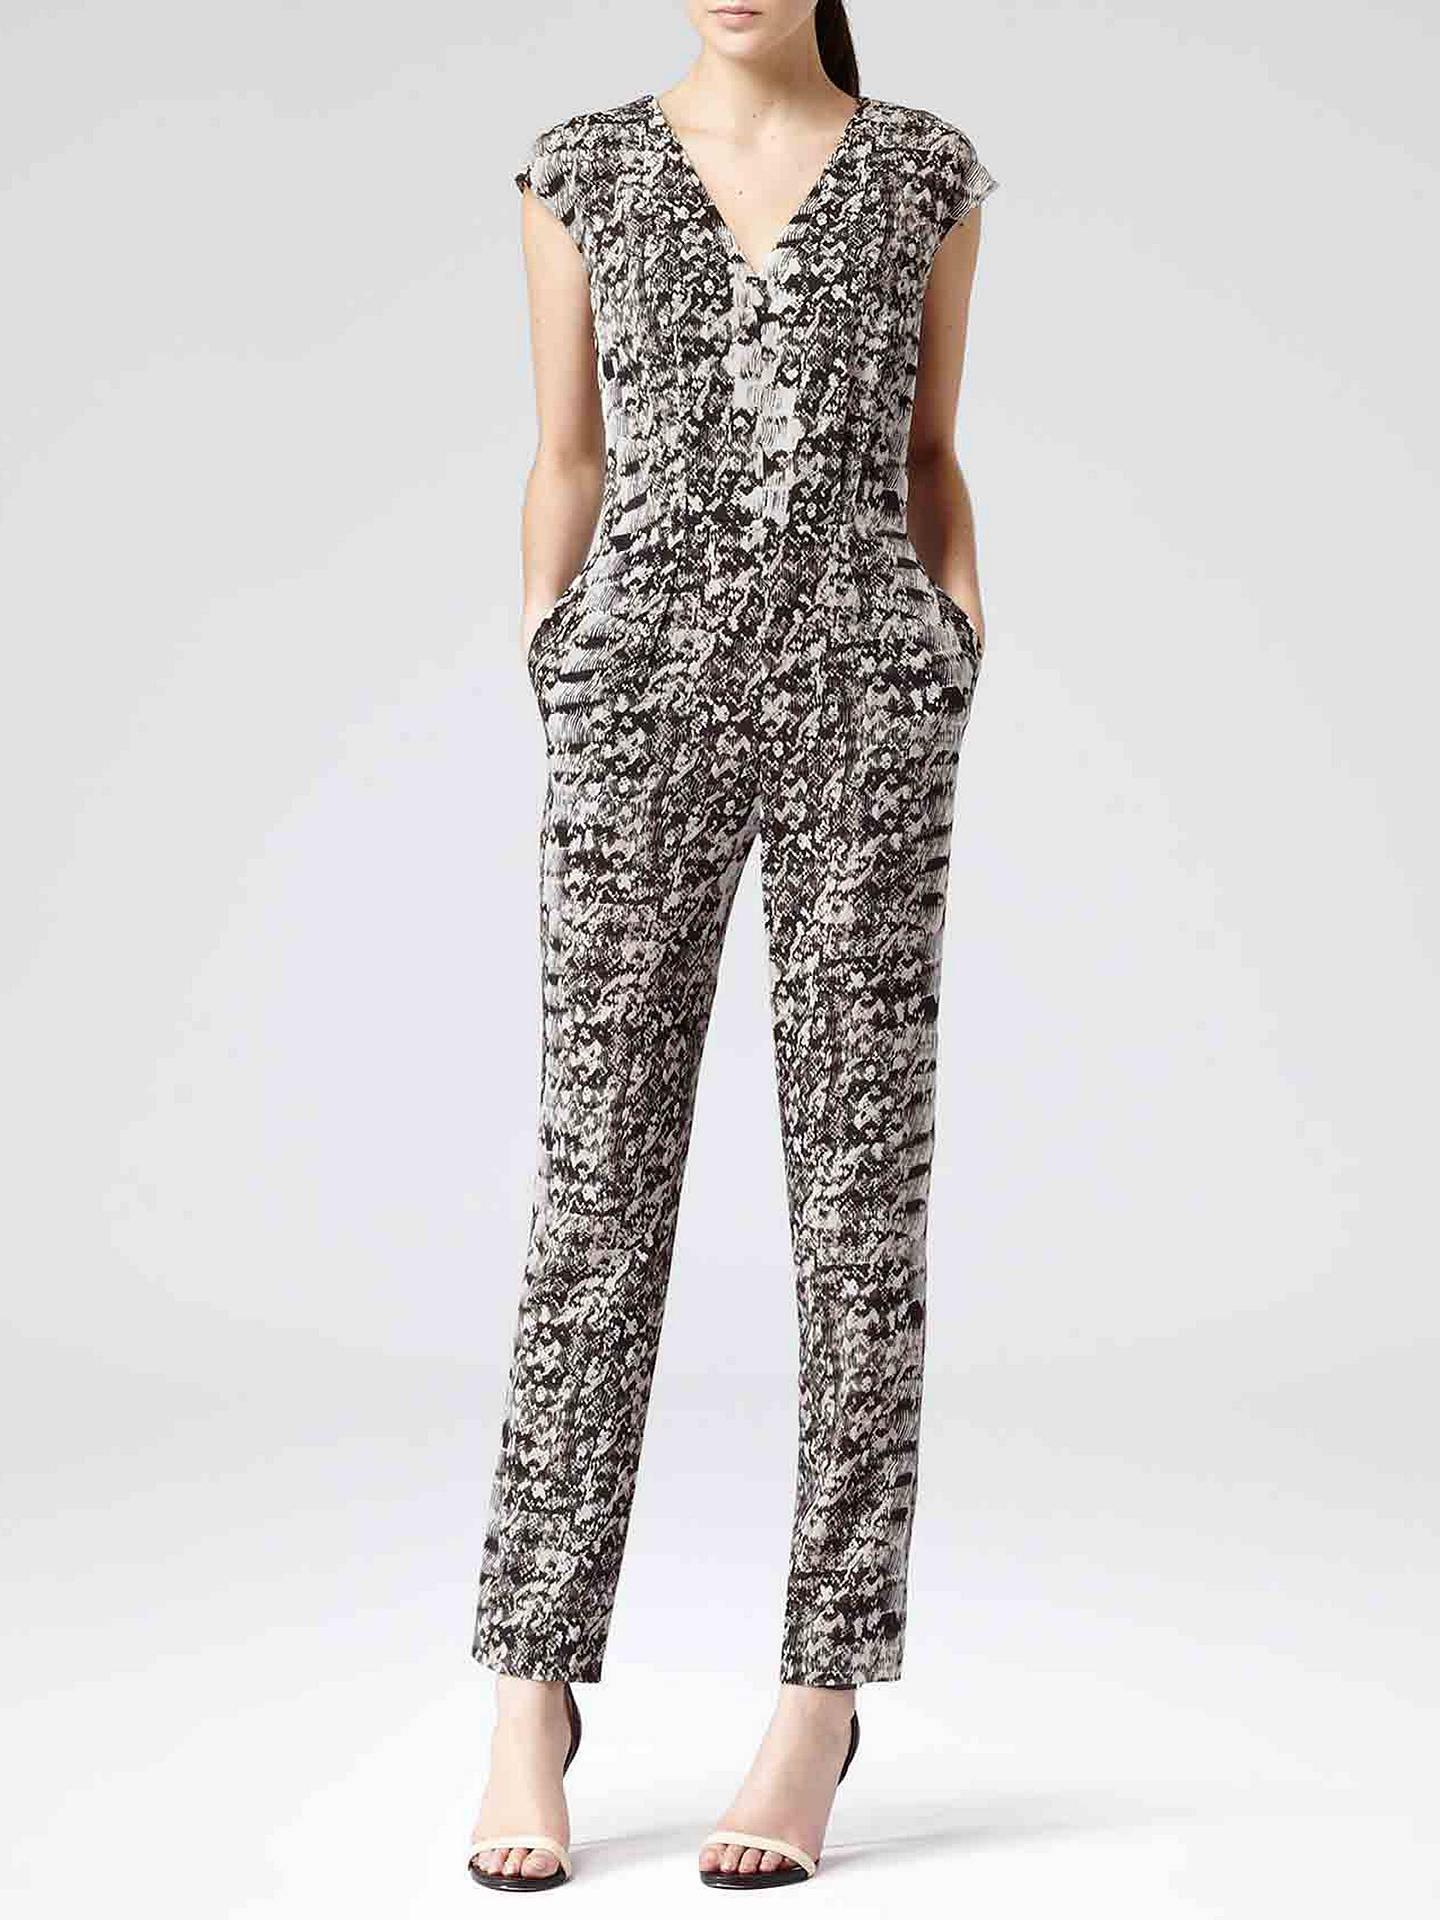 ec2c39d4854 ... Buy Reiss Printed Monica Jumpsuit